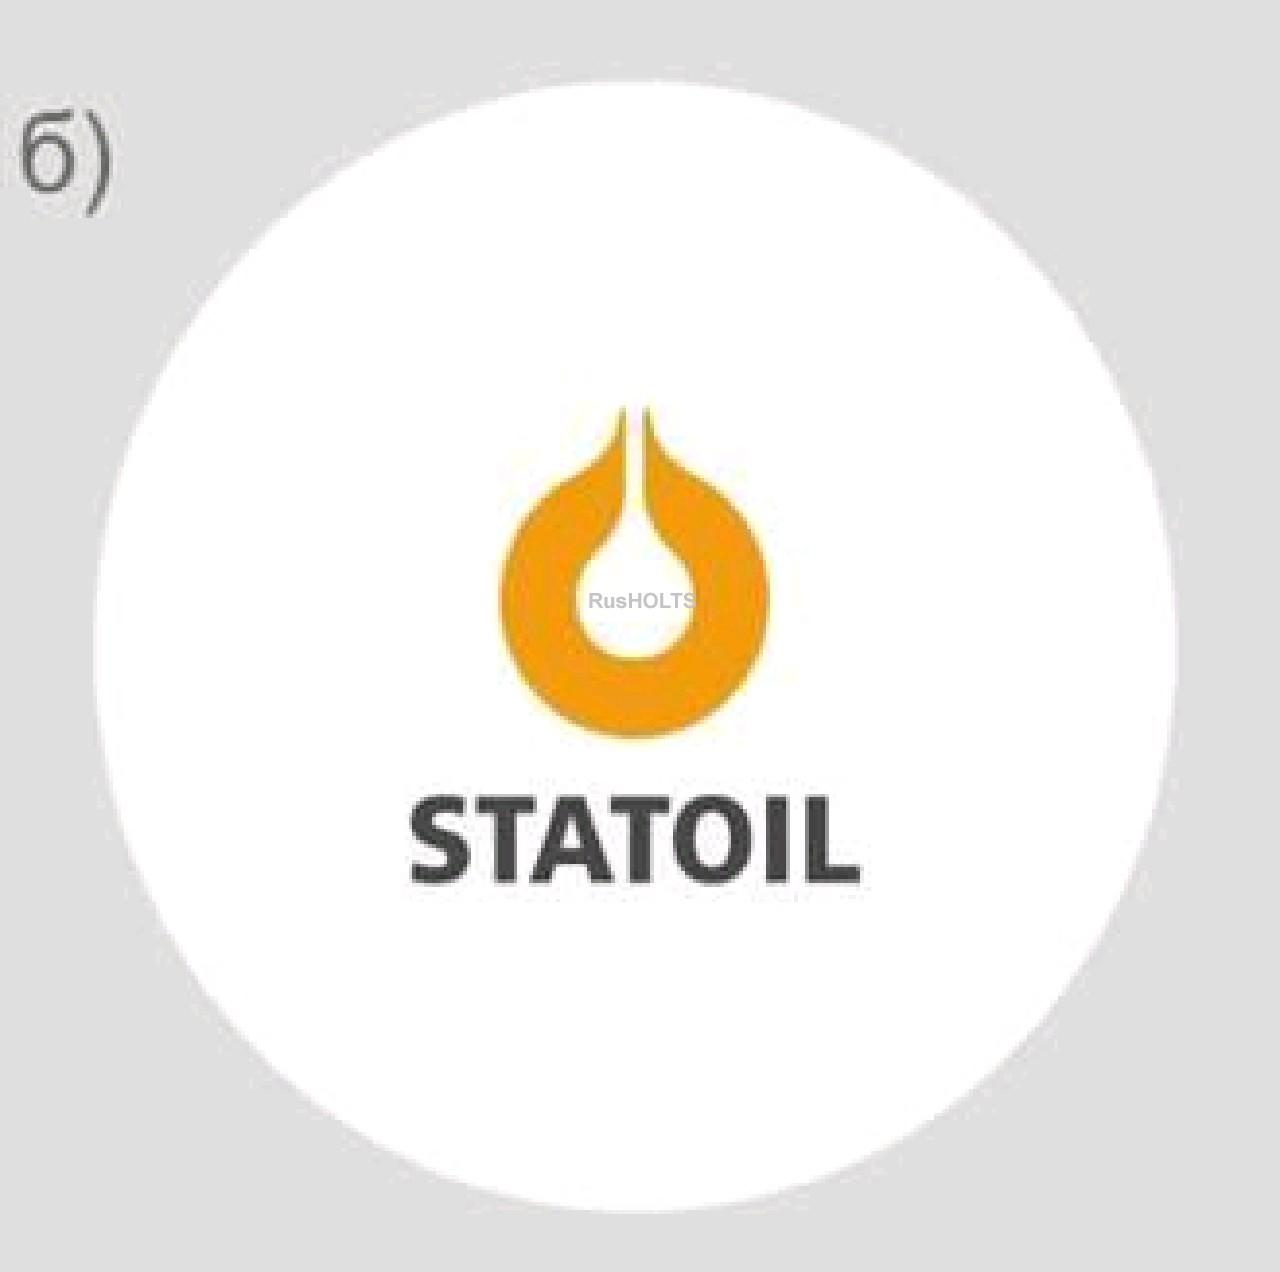 Наклейка световозвращающая Statoil